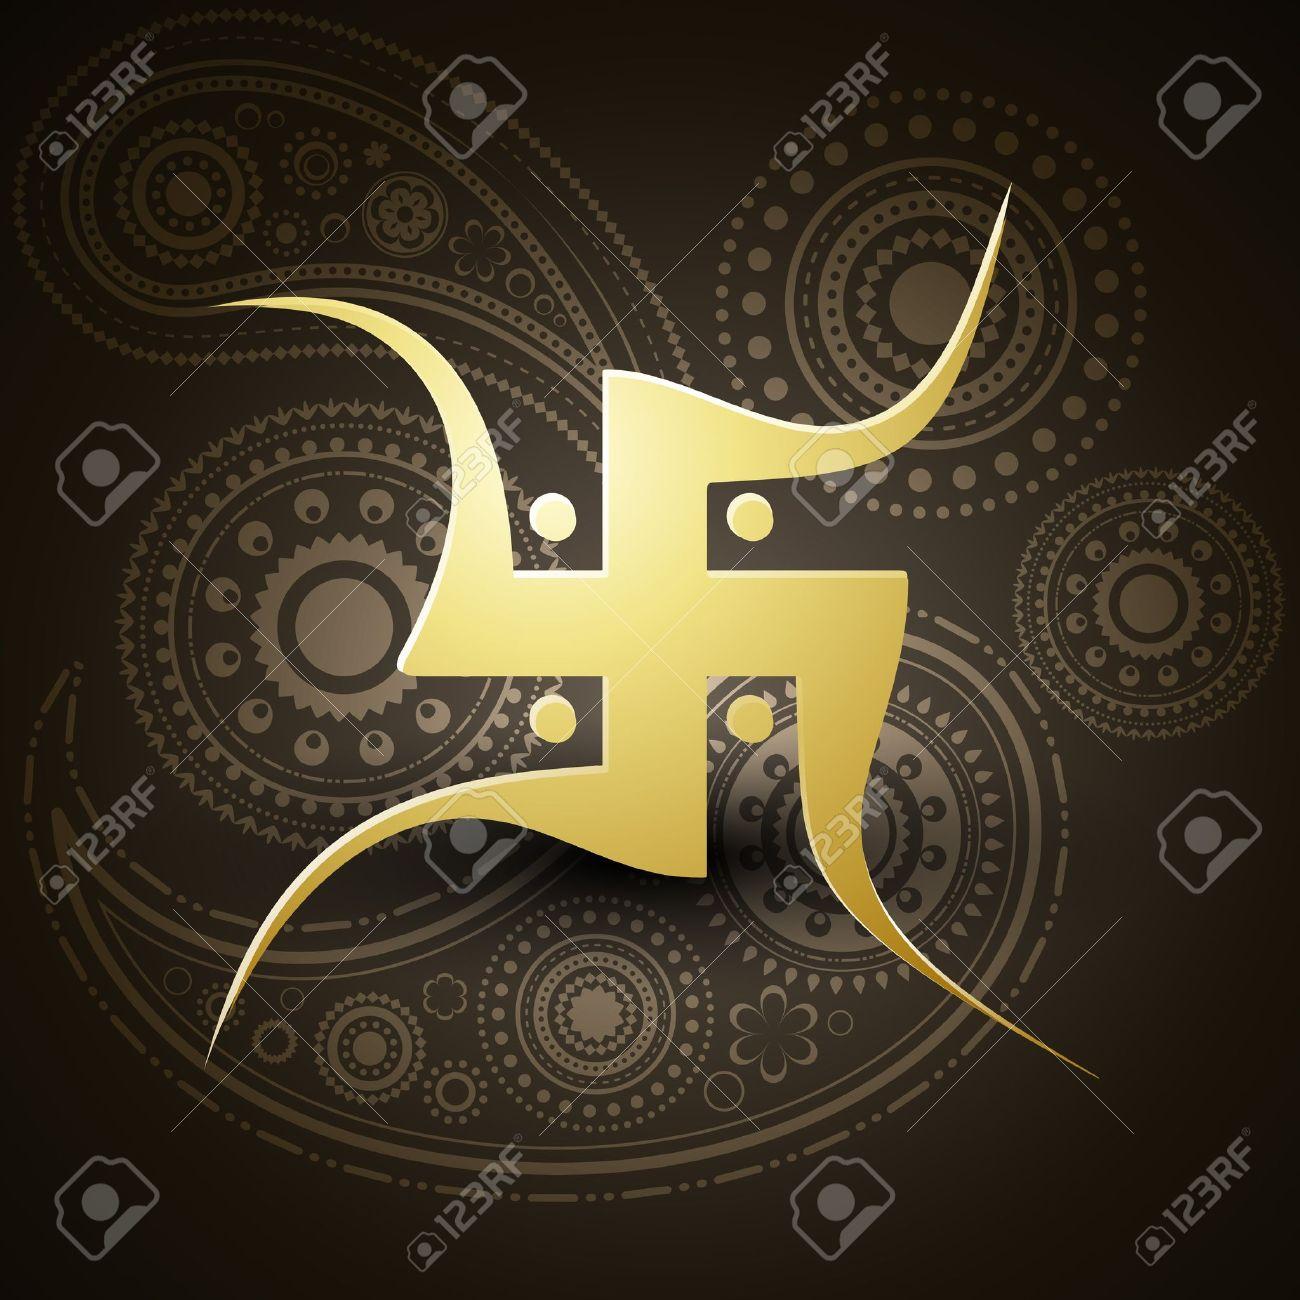 vector golden swastik symbol on dark background Stock Vector - 11004420